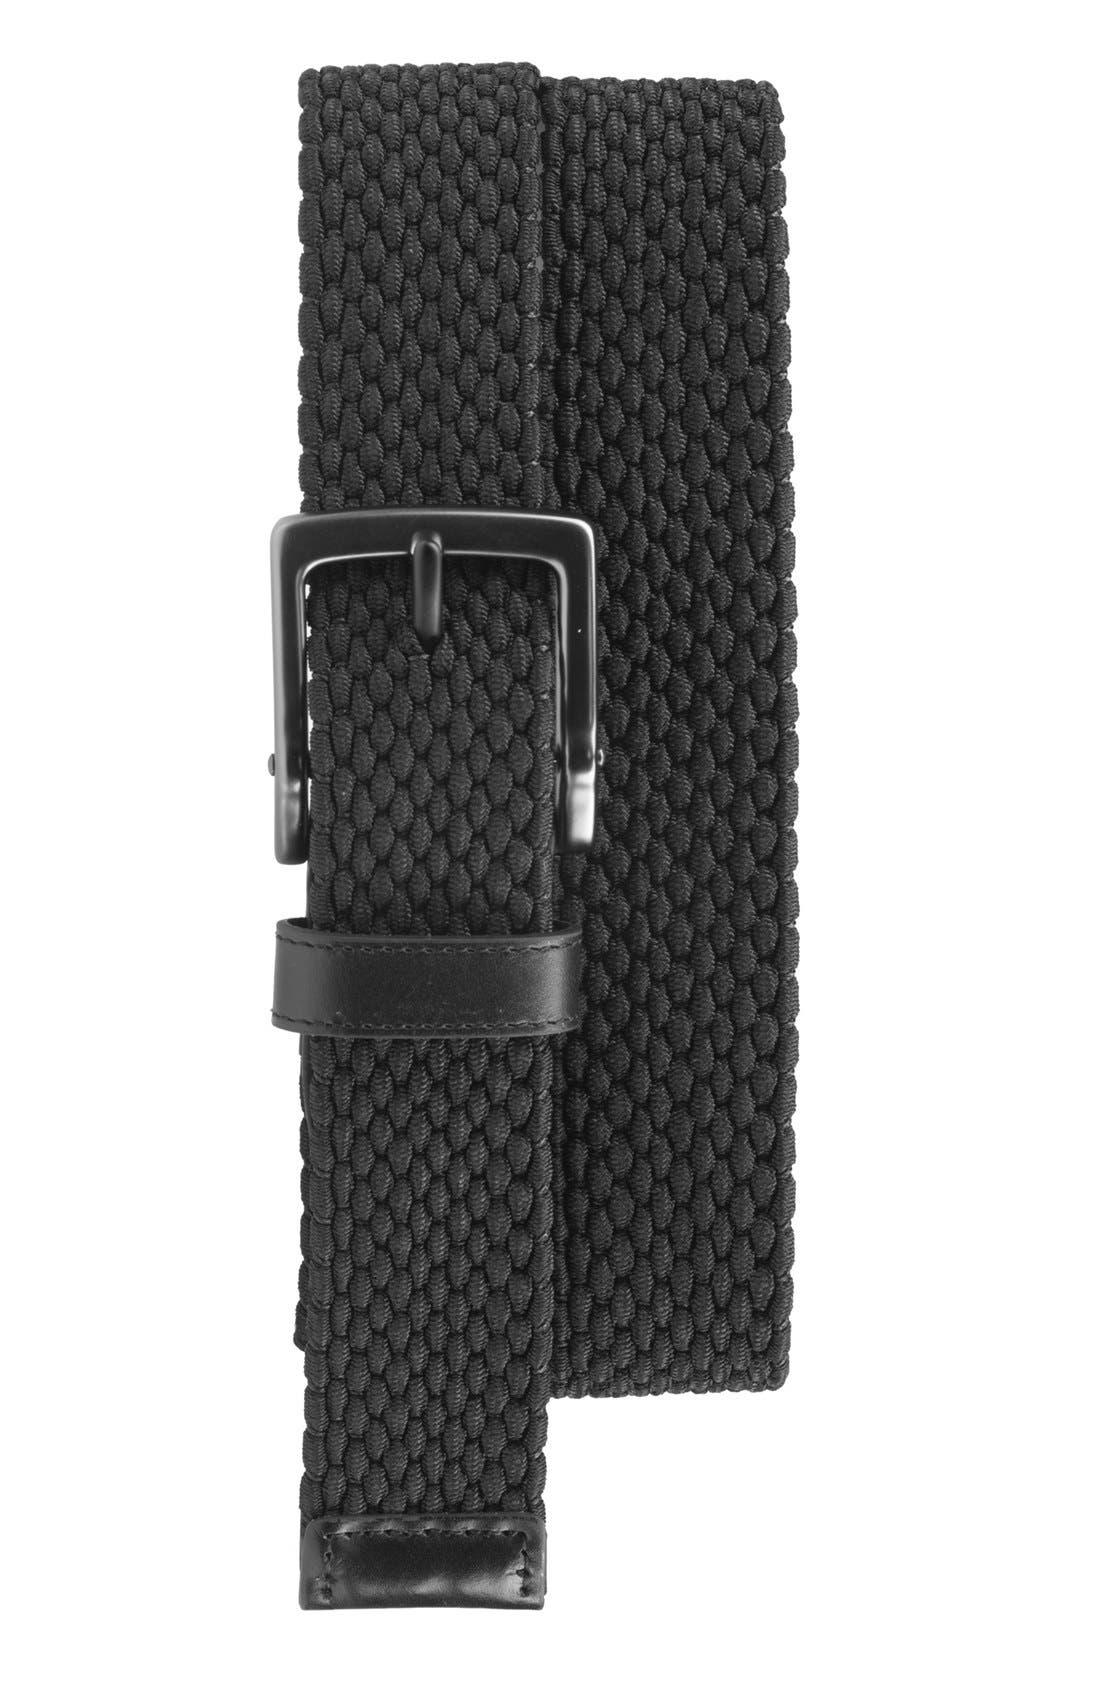 Nike Stretch Woven Belt, Black